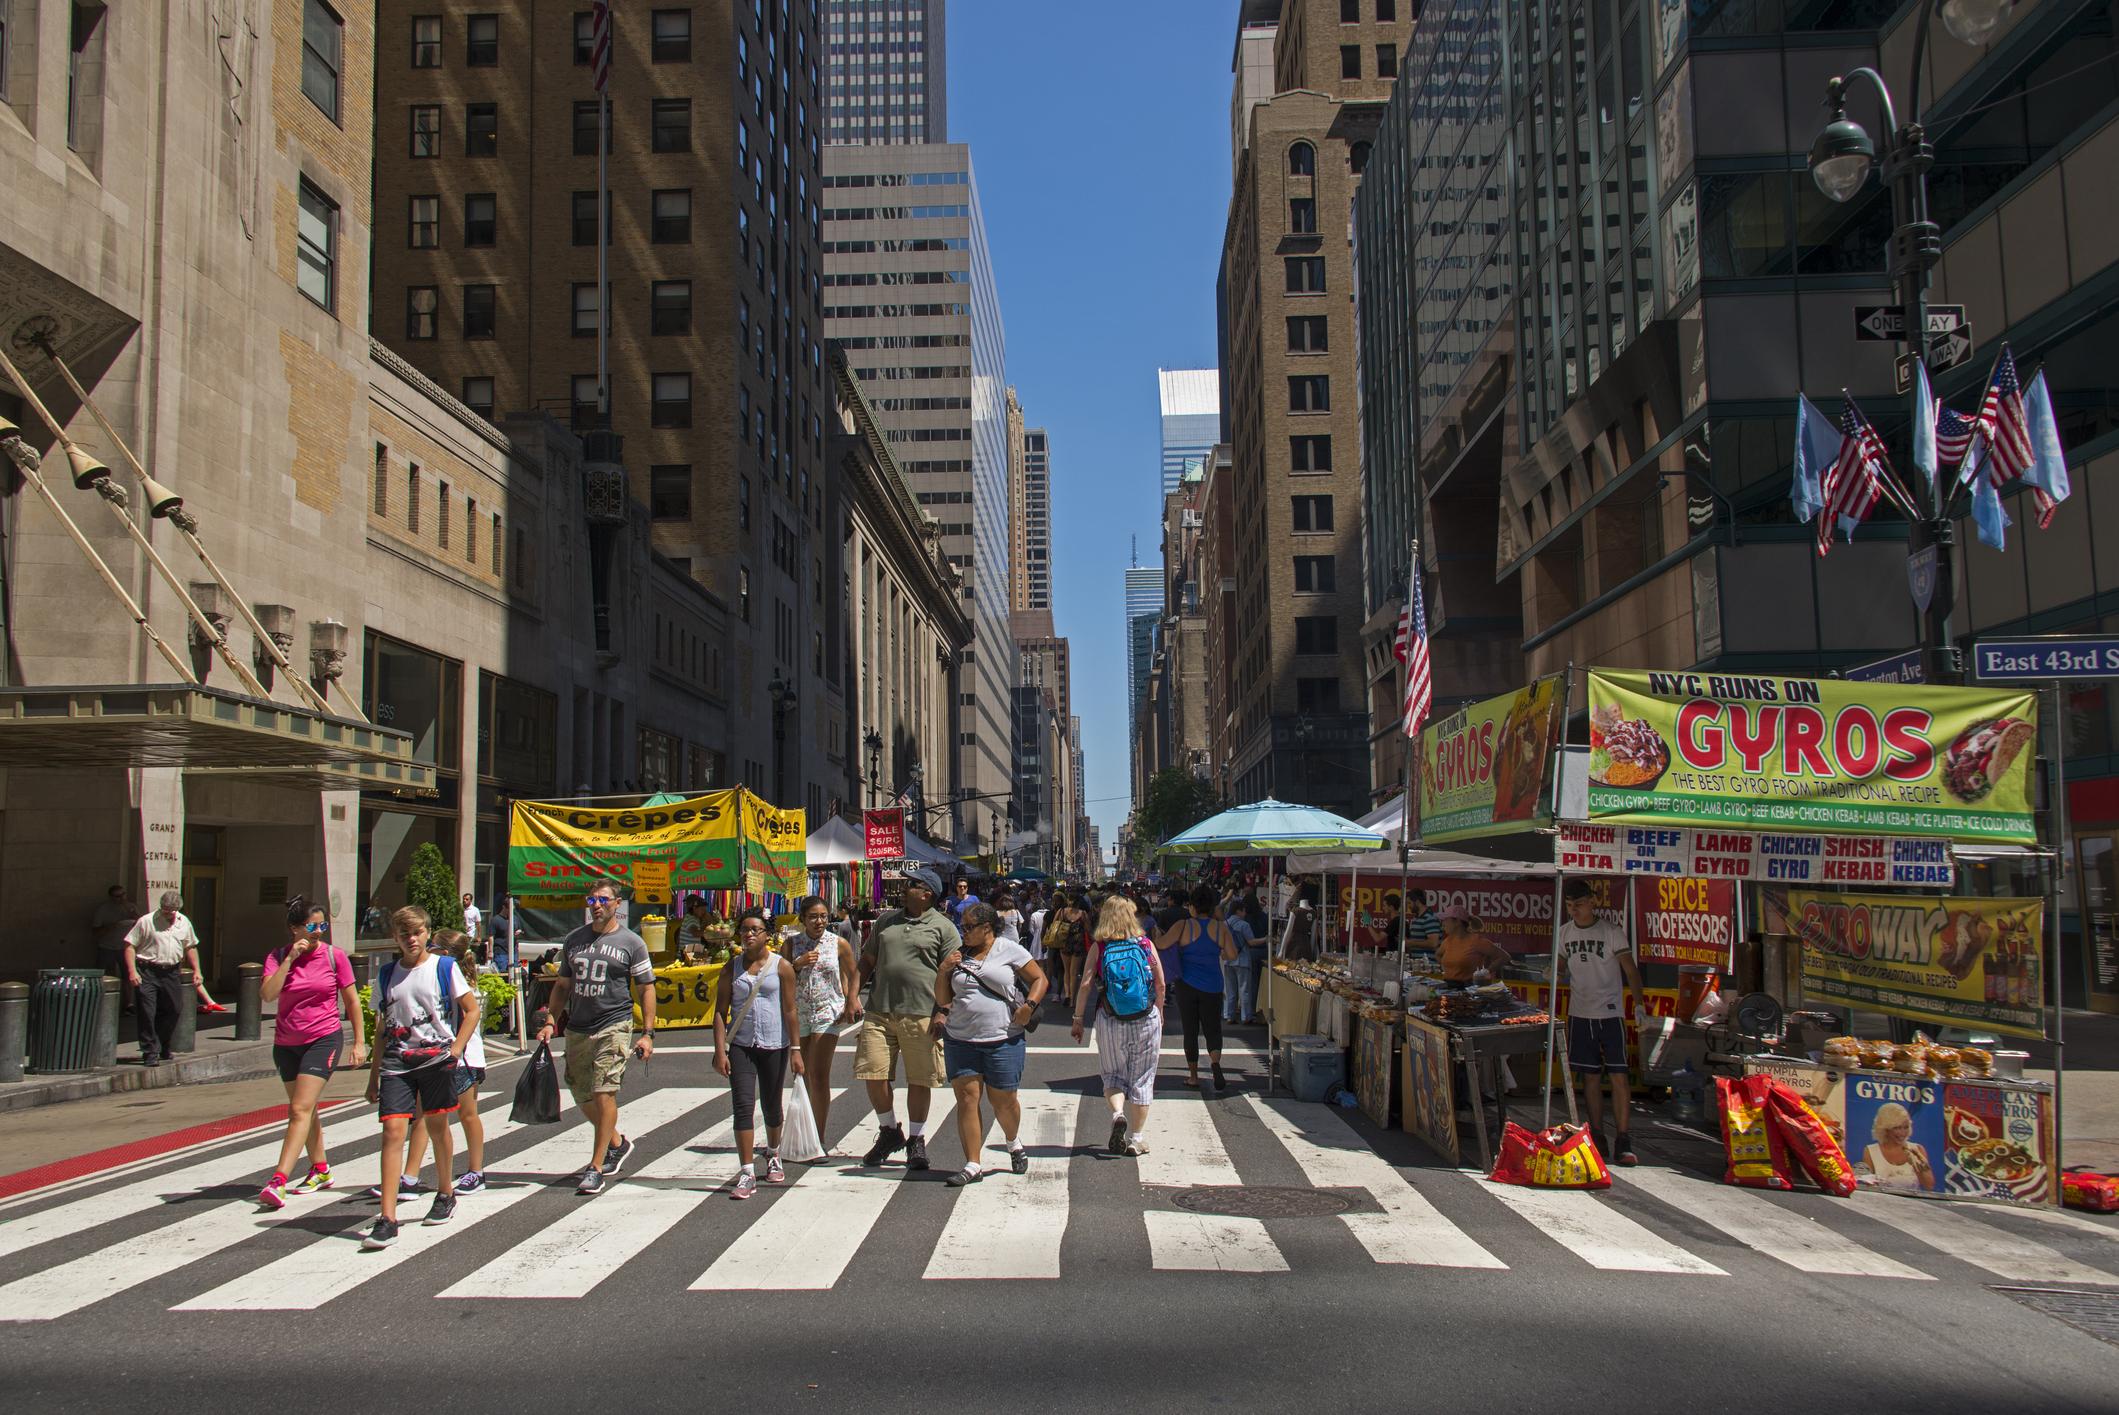 Summer Street 2018 image